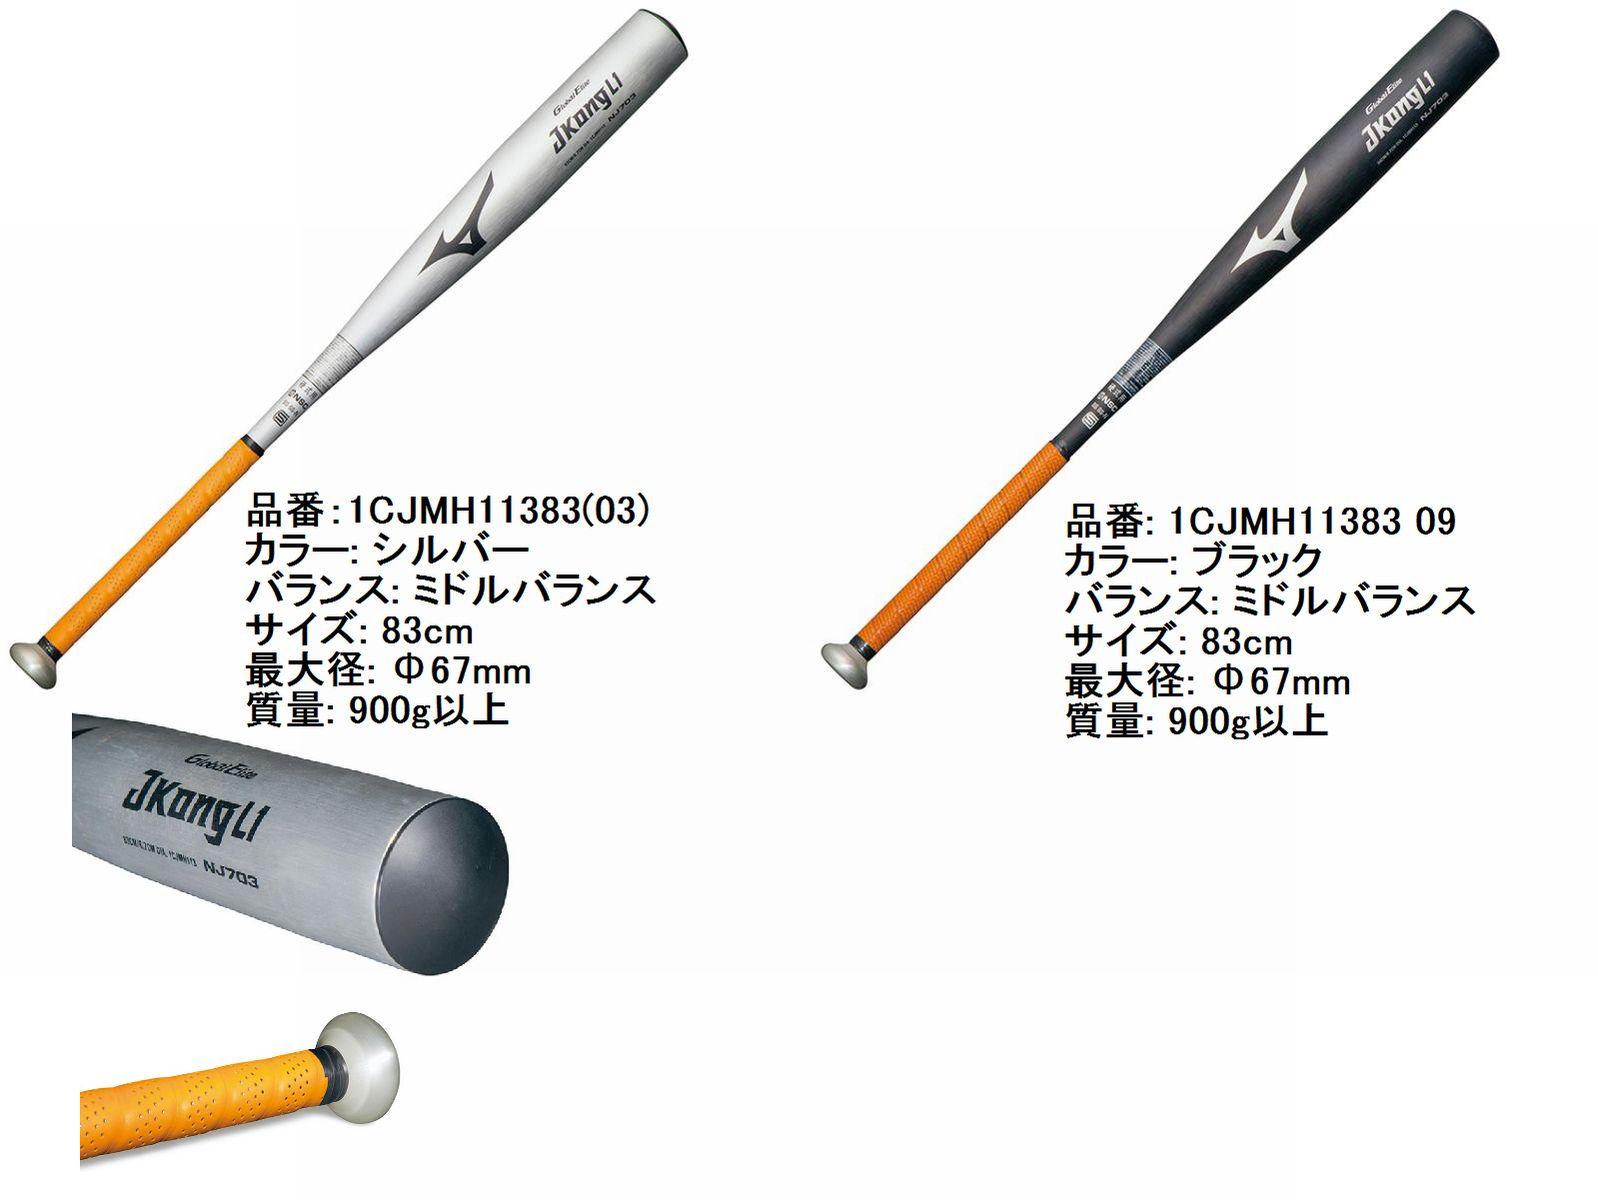 【Mizuno Global Elite=ミズノ・グローバルエリート】野球 硬式 金属製バット<金属製 JコングL1(金属製)>(83cm/900g以上/ミドルバランス)[ブラック/シルバー]